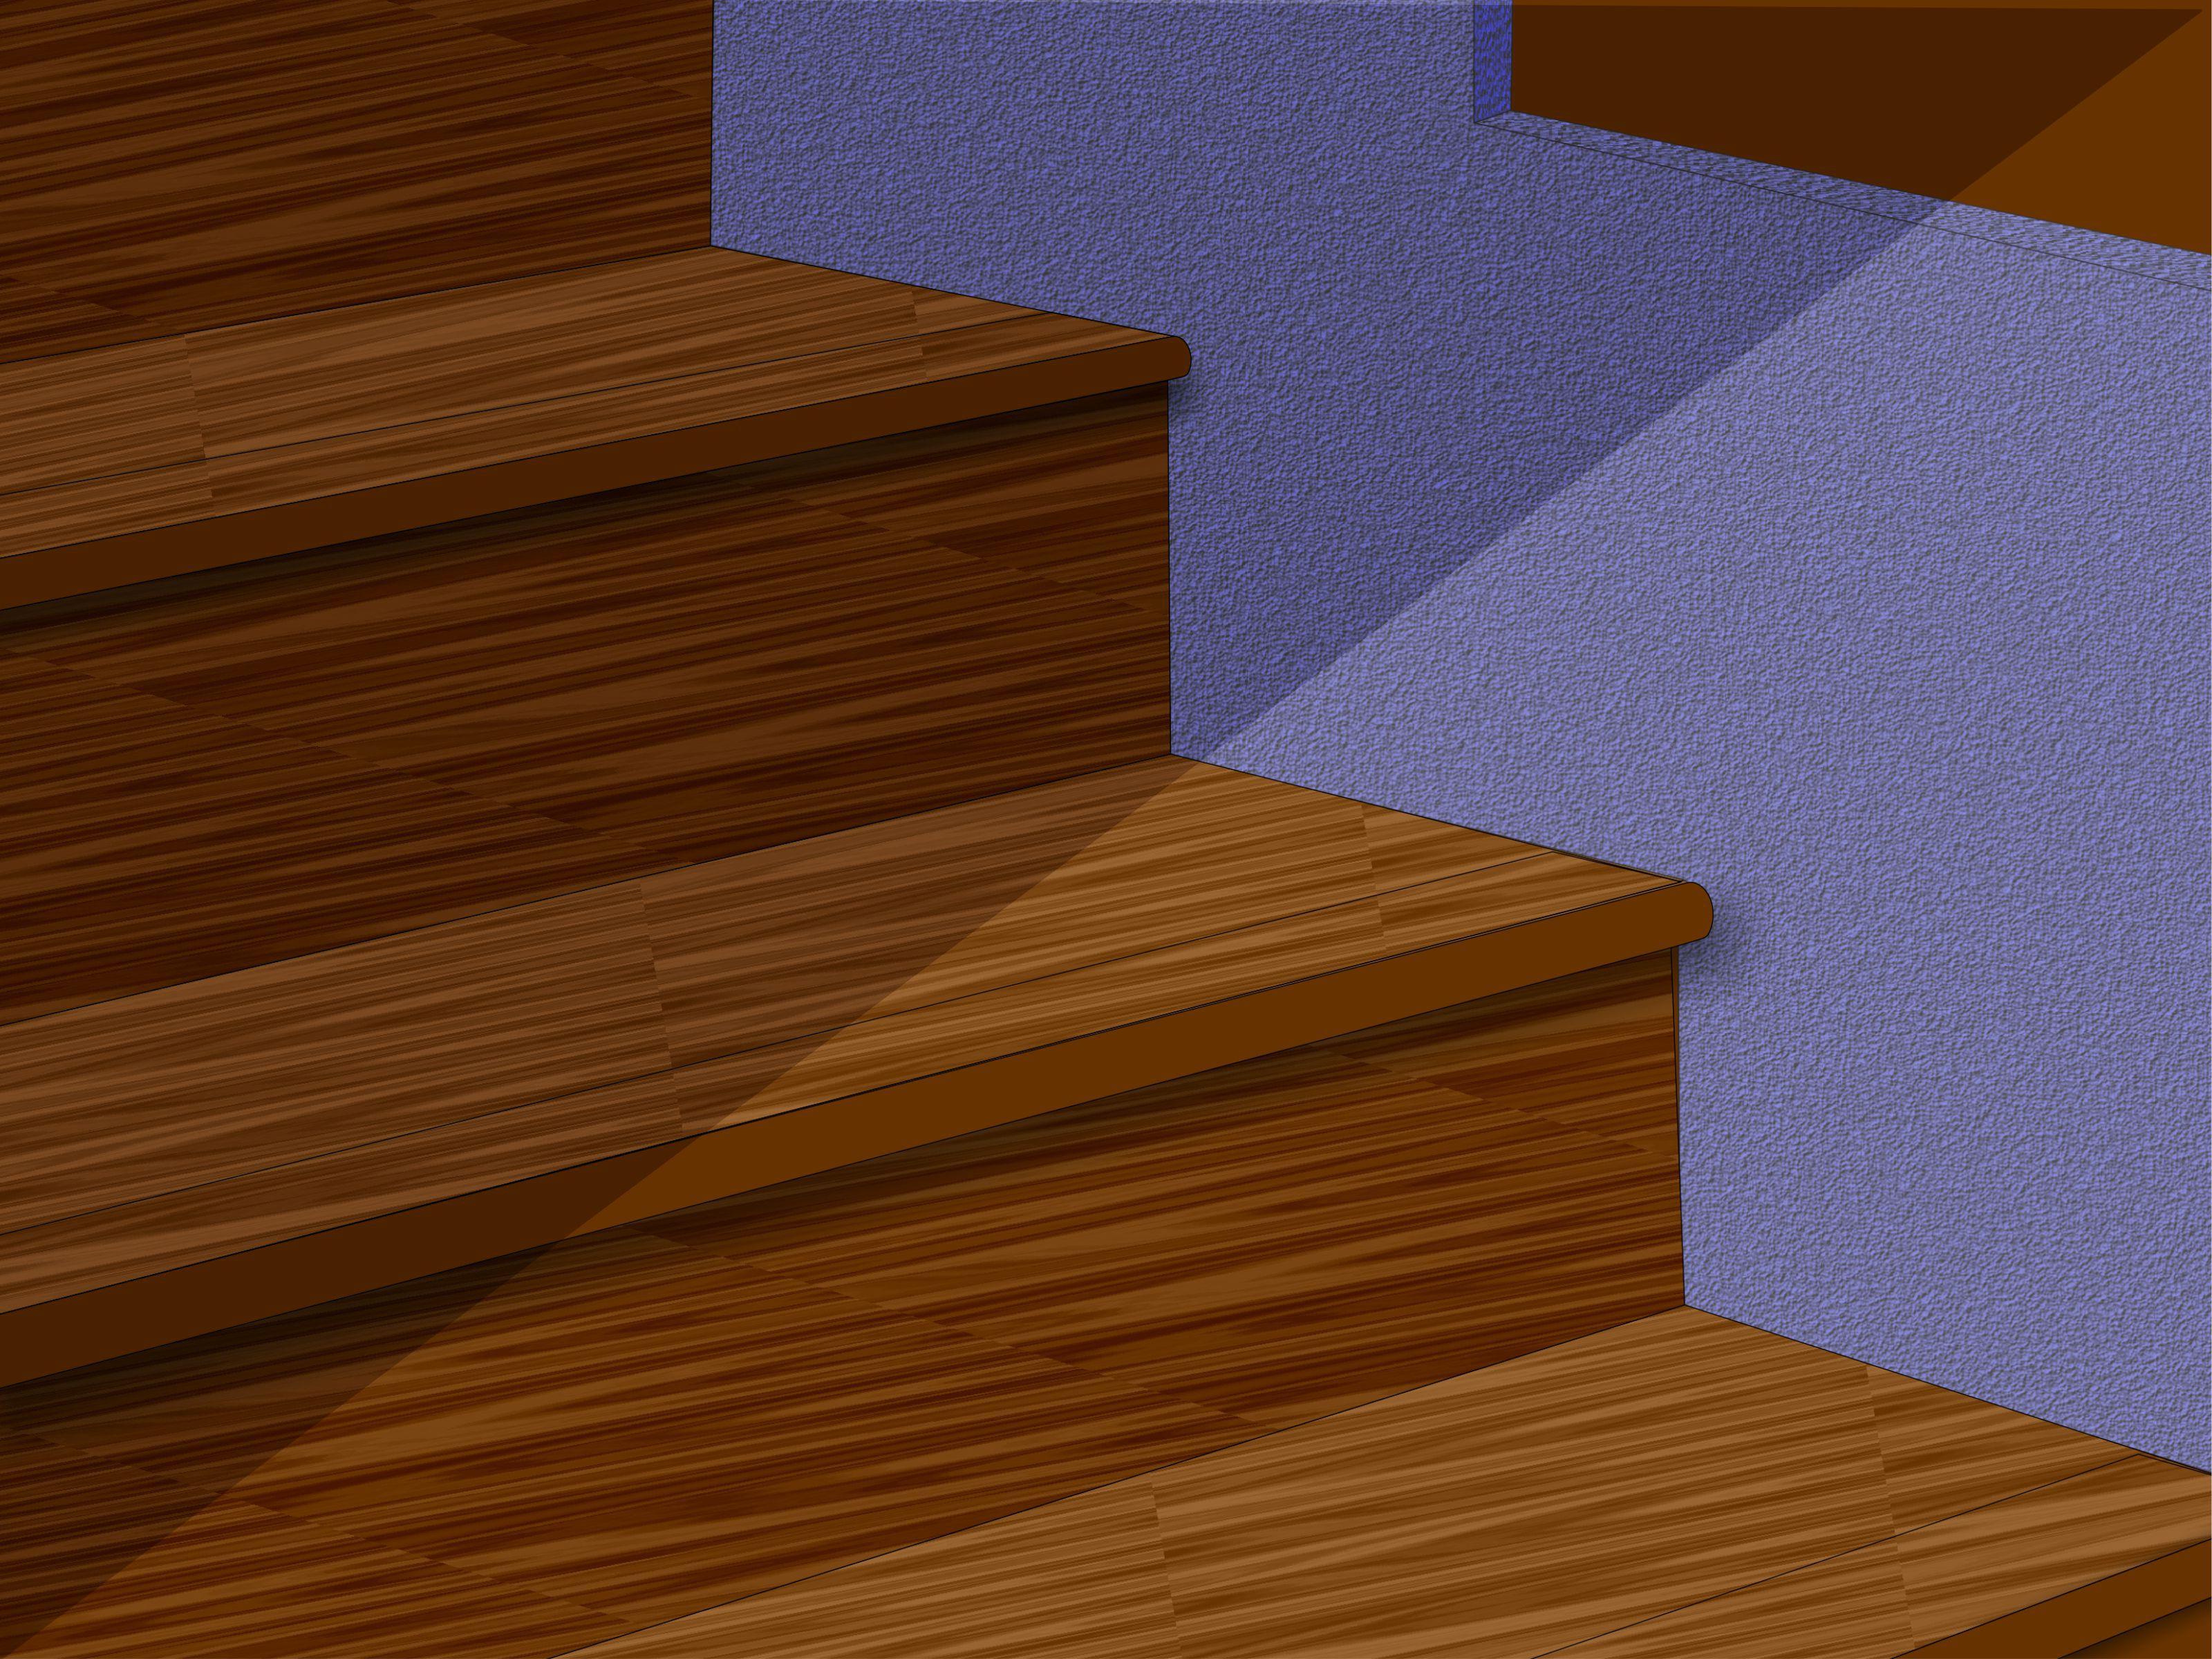 Laminate Flooring Video Laminate Flooring Stairs